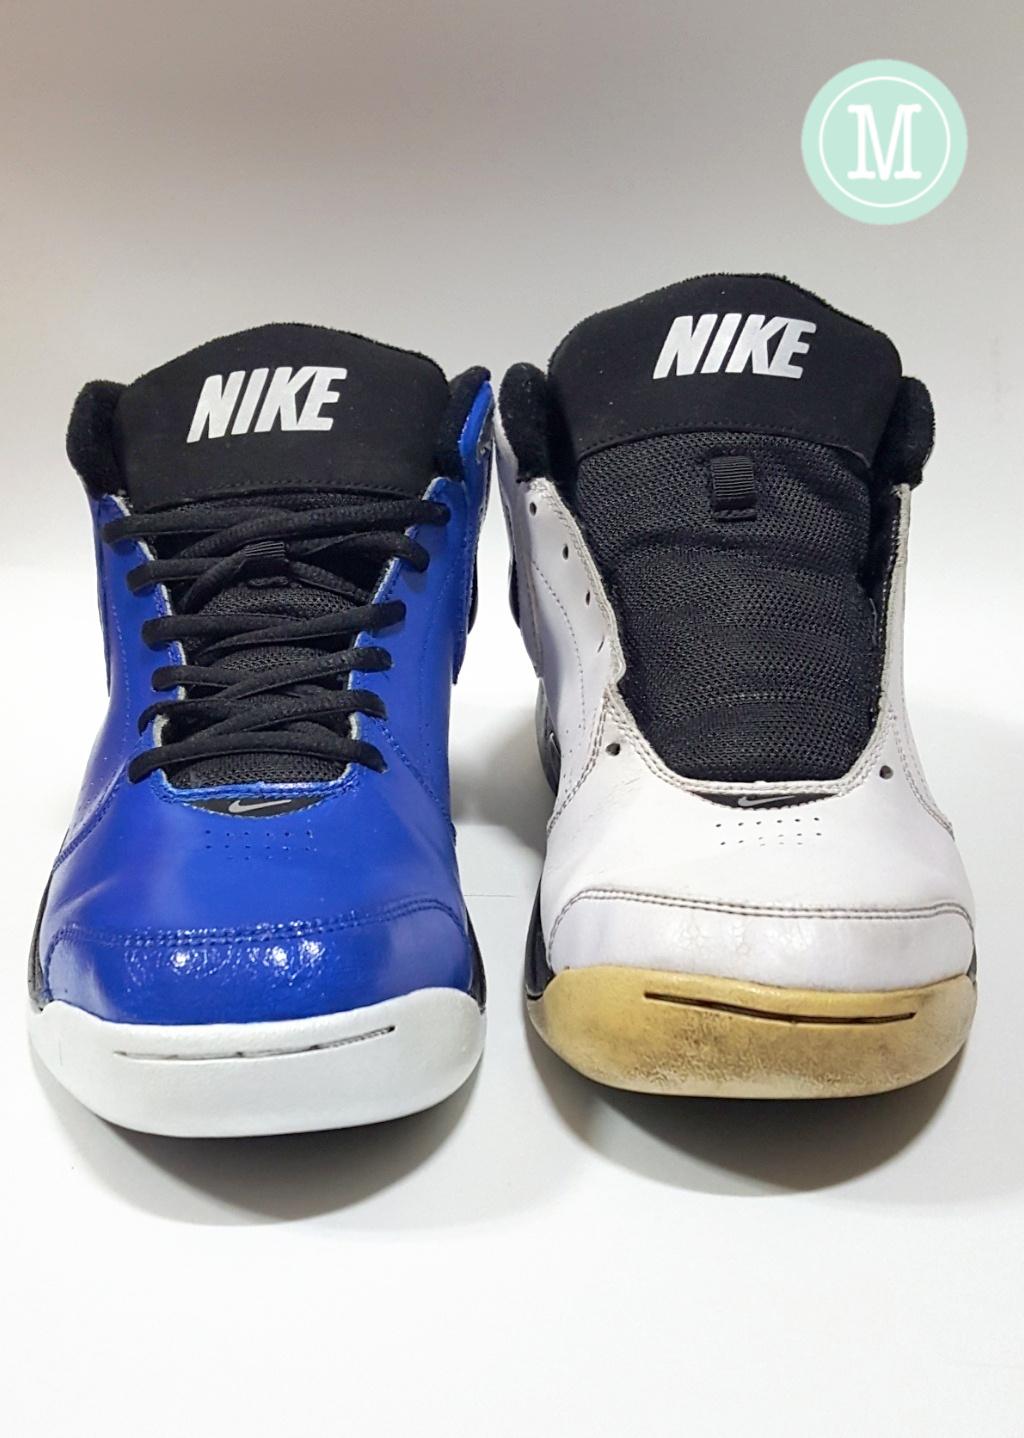 Están deprimidos juntos Glamour  Cold Blue Nike Overplay V recolor by mintyfresh89 on DeviantArt